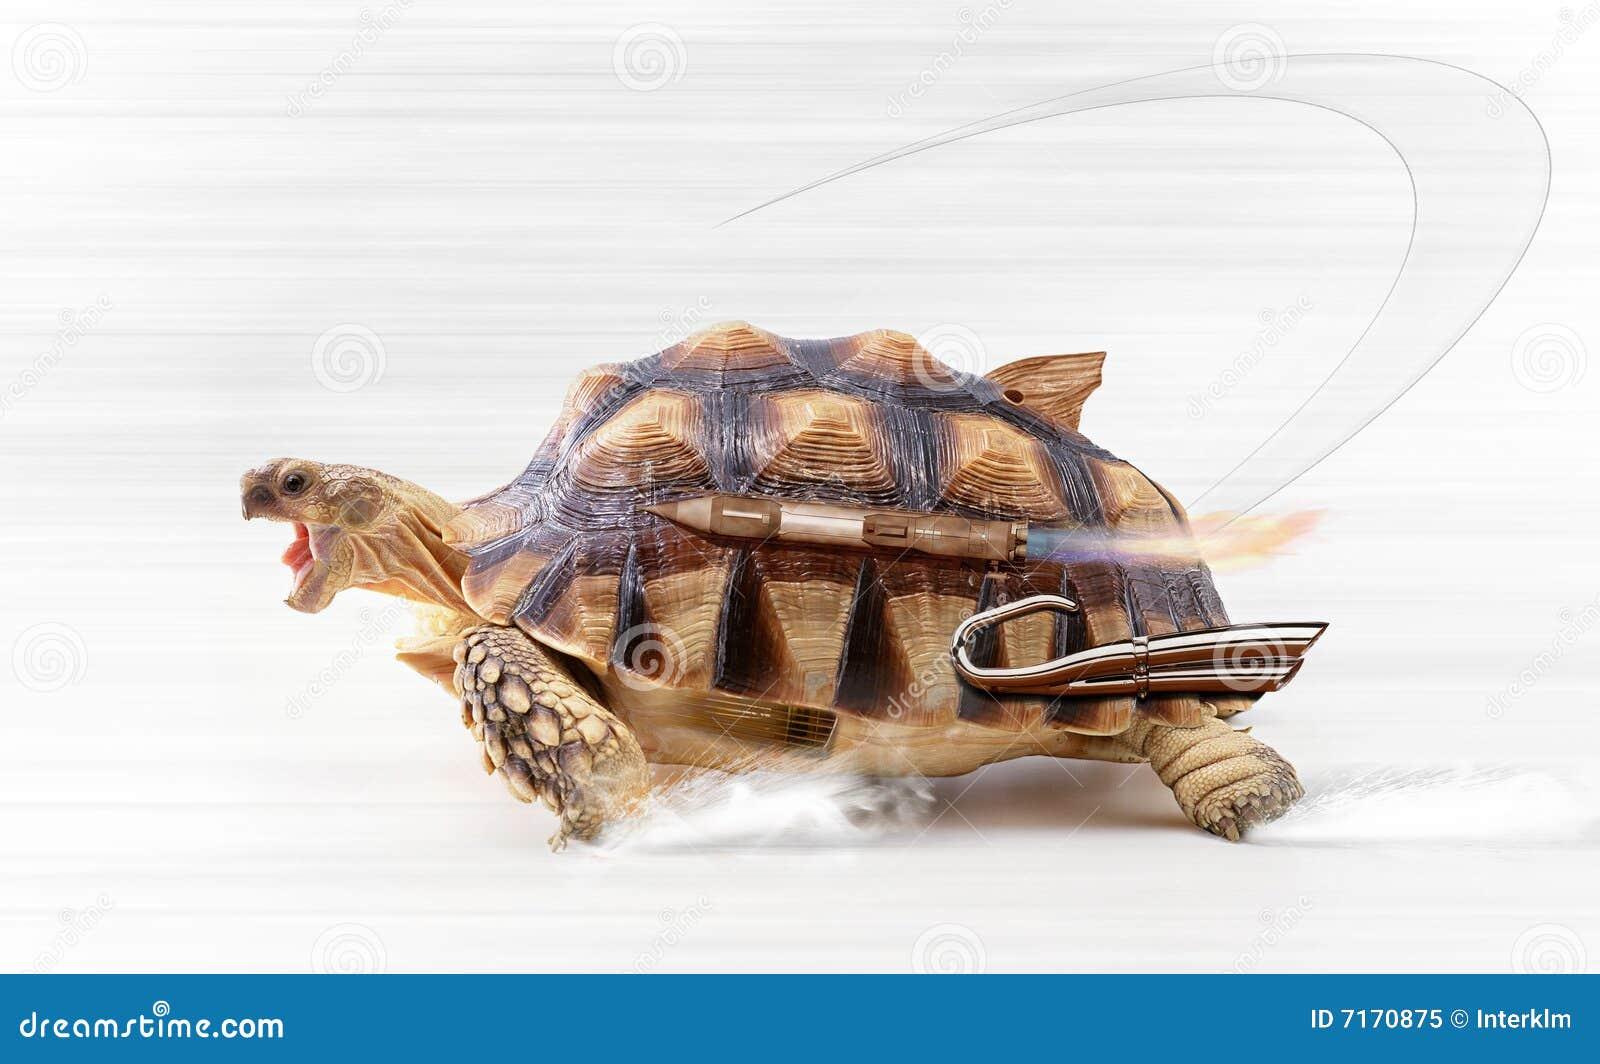 fast-turtle-7170875.jpg